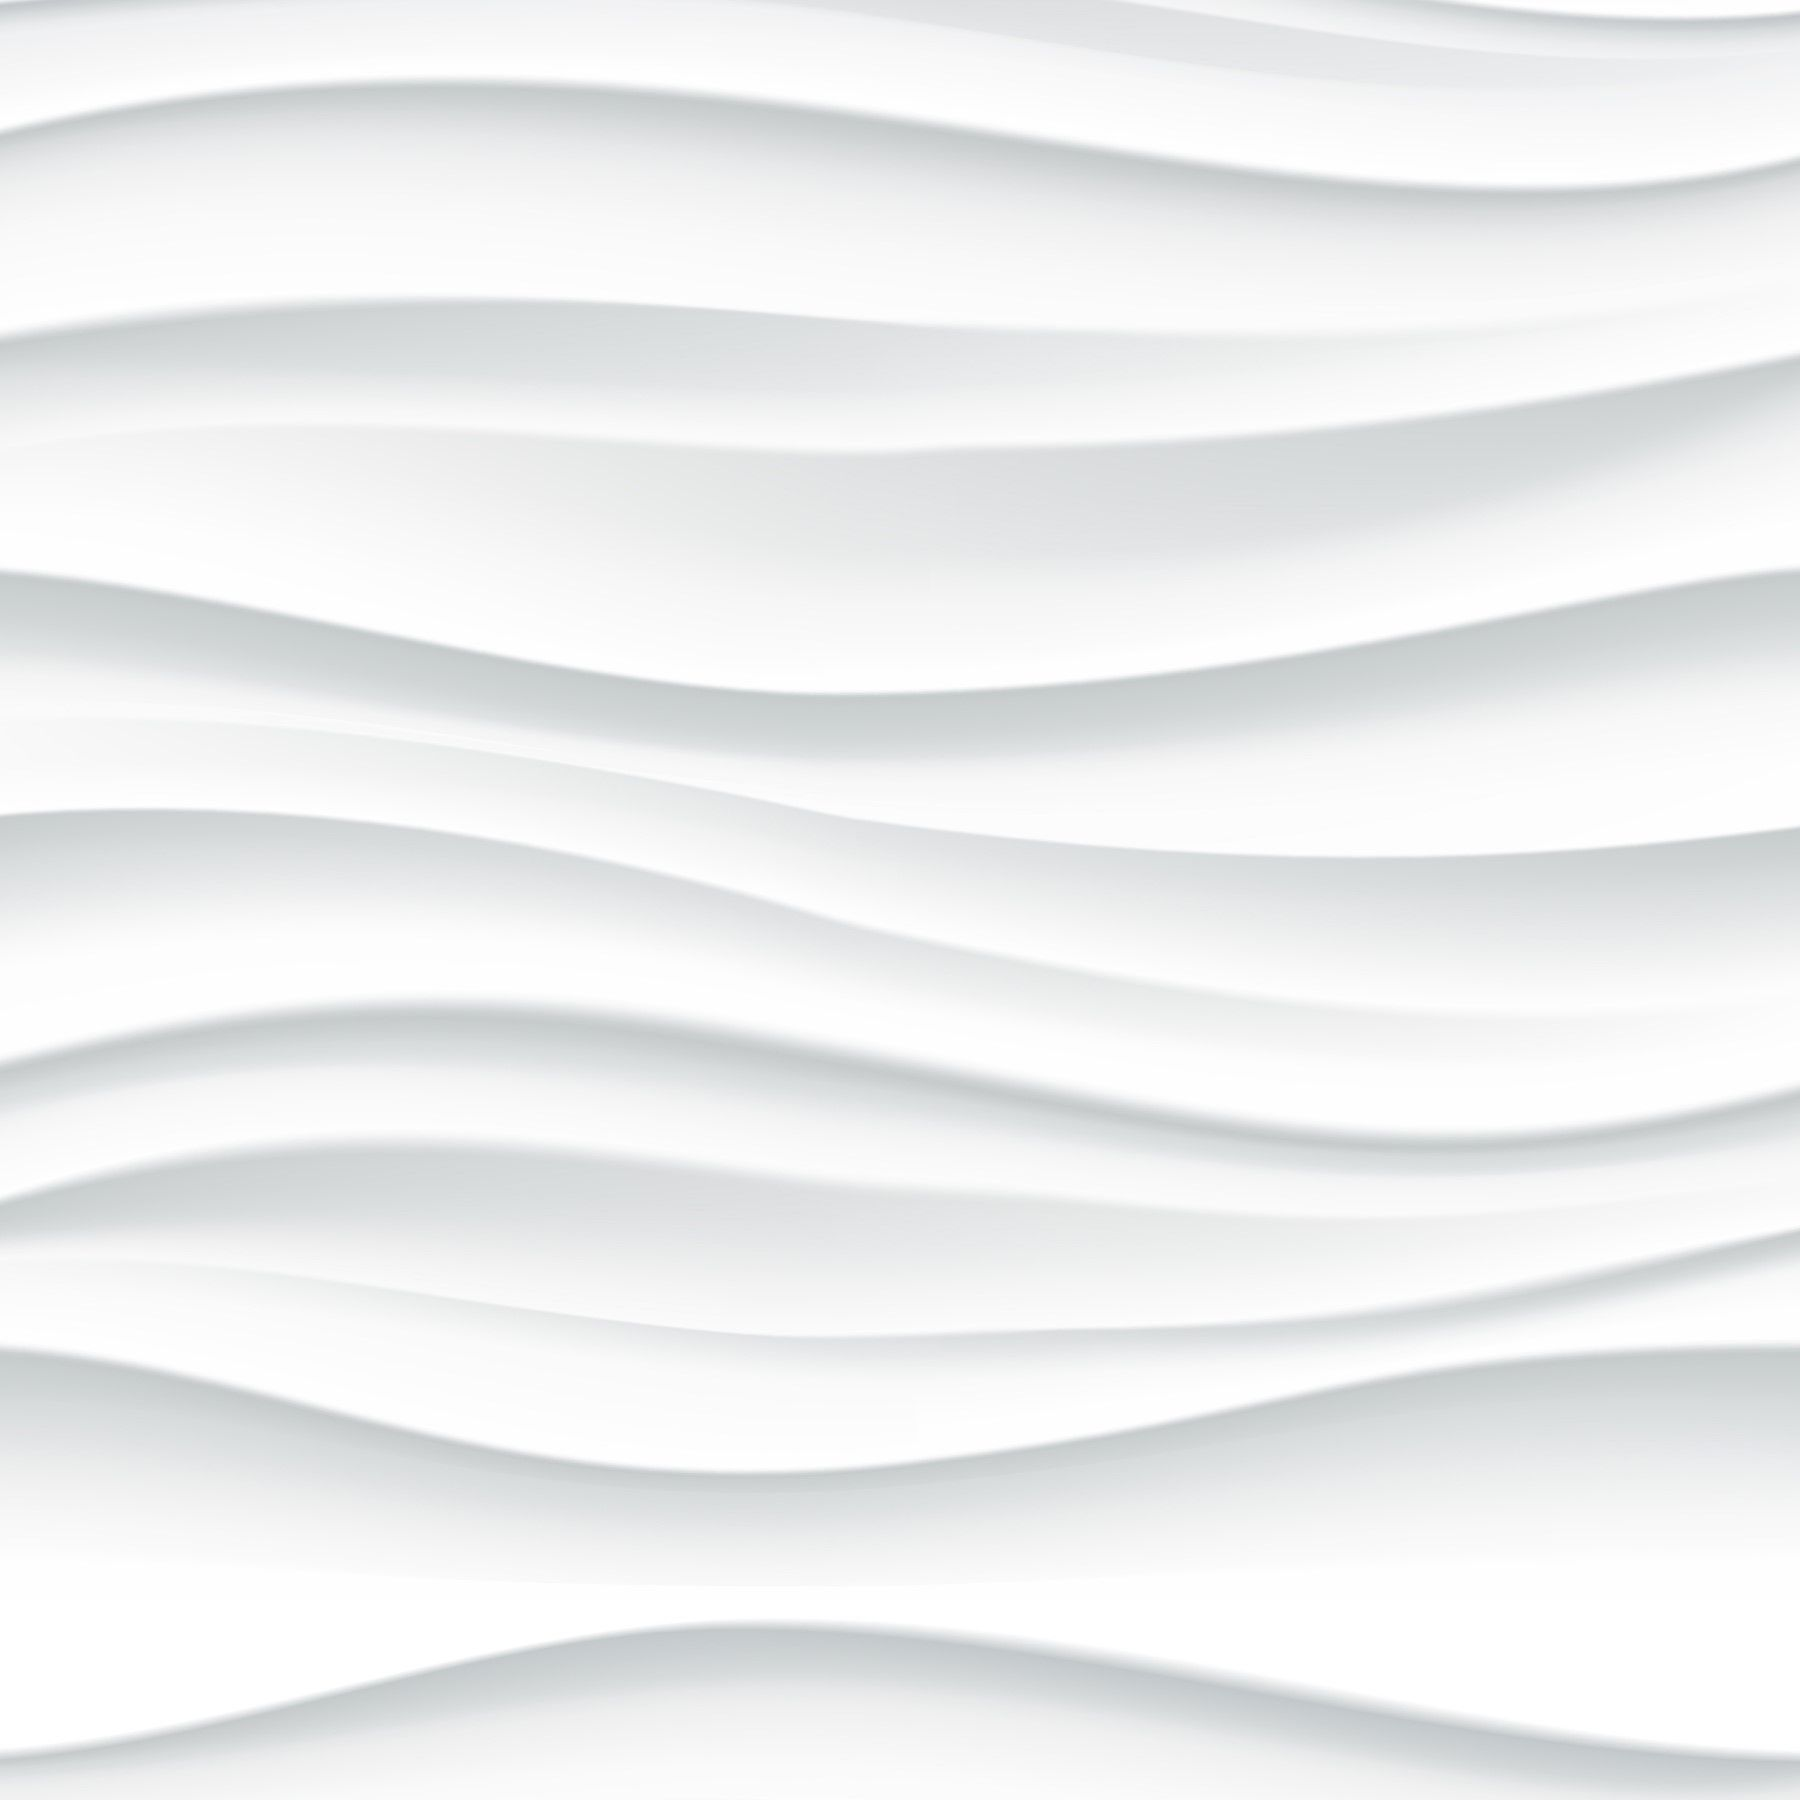 Papel de Parede Efeito 3D Lavável CO-703 - Cole Aí